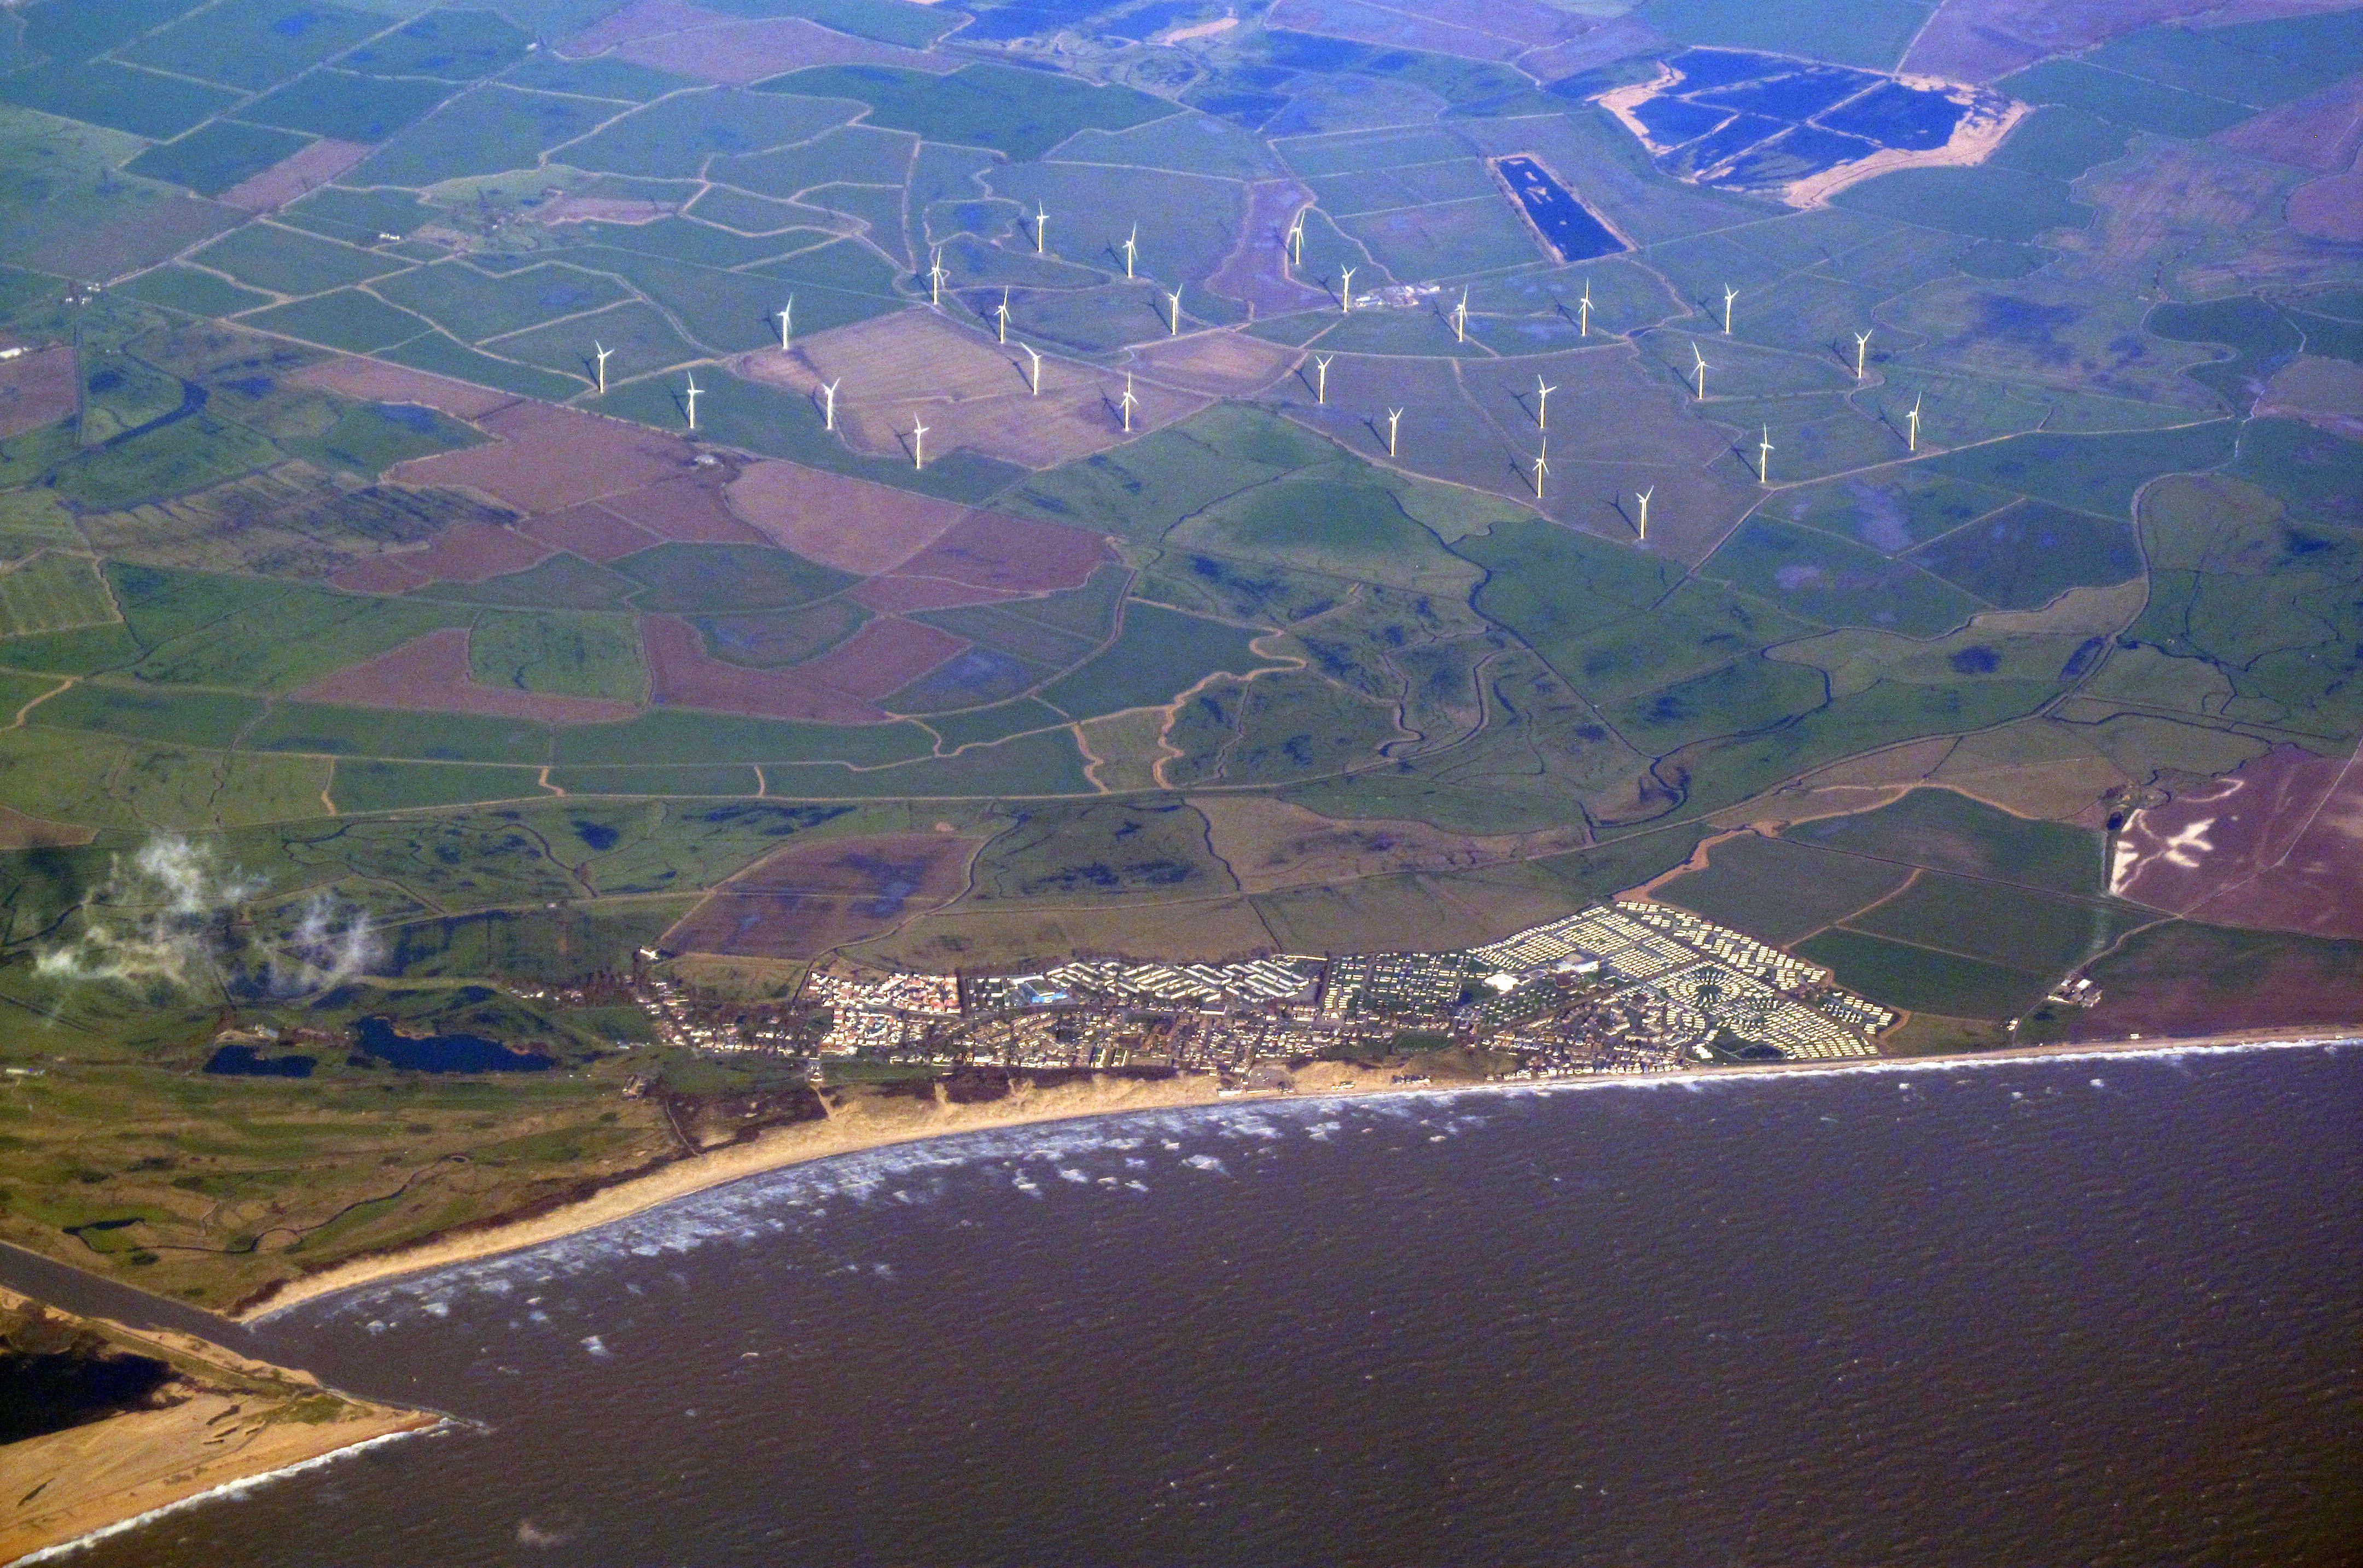 Dallington United Kingdom  City pictures : Aerial view, showing the Dallington, United Kingdom